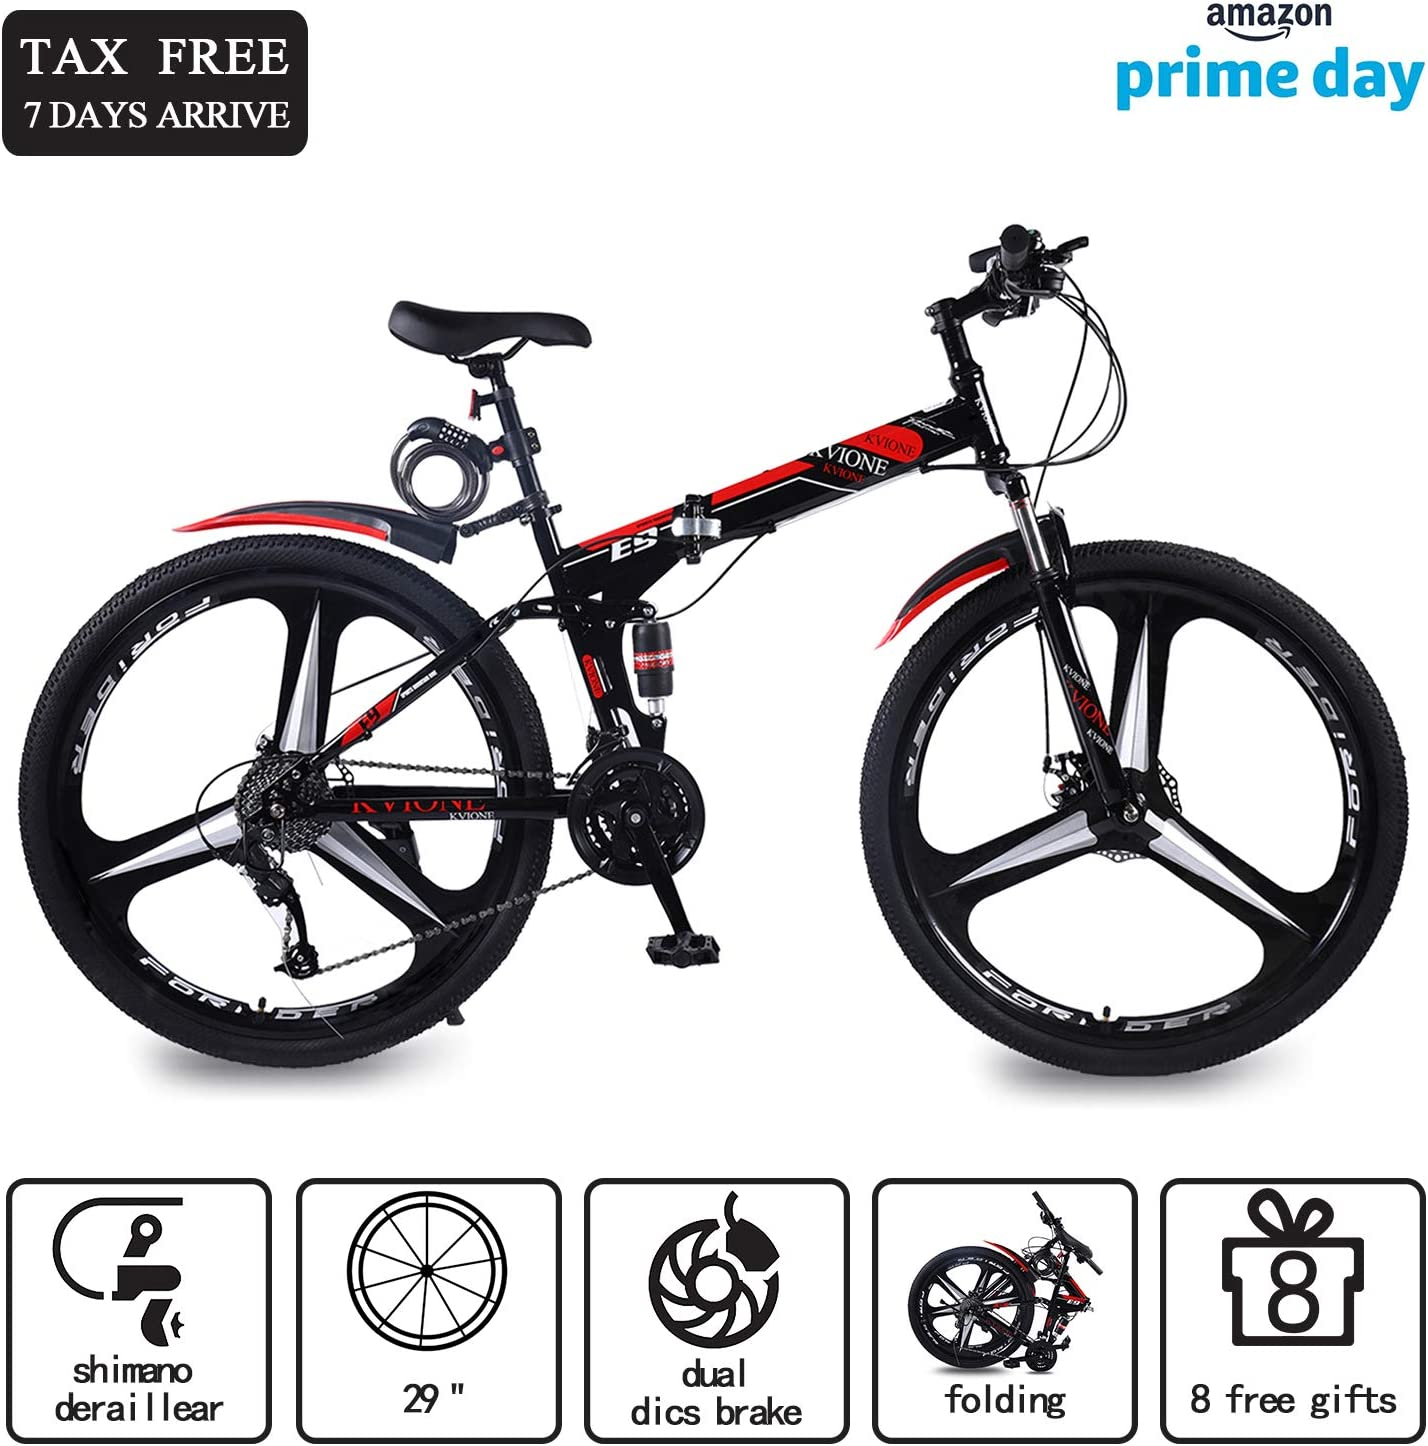 KVIONE E9 Bicicleta de montaña de 27 velocidades para Hombres y ...